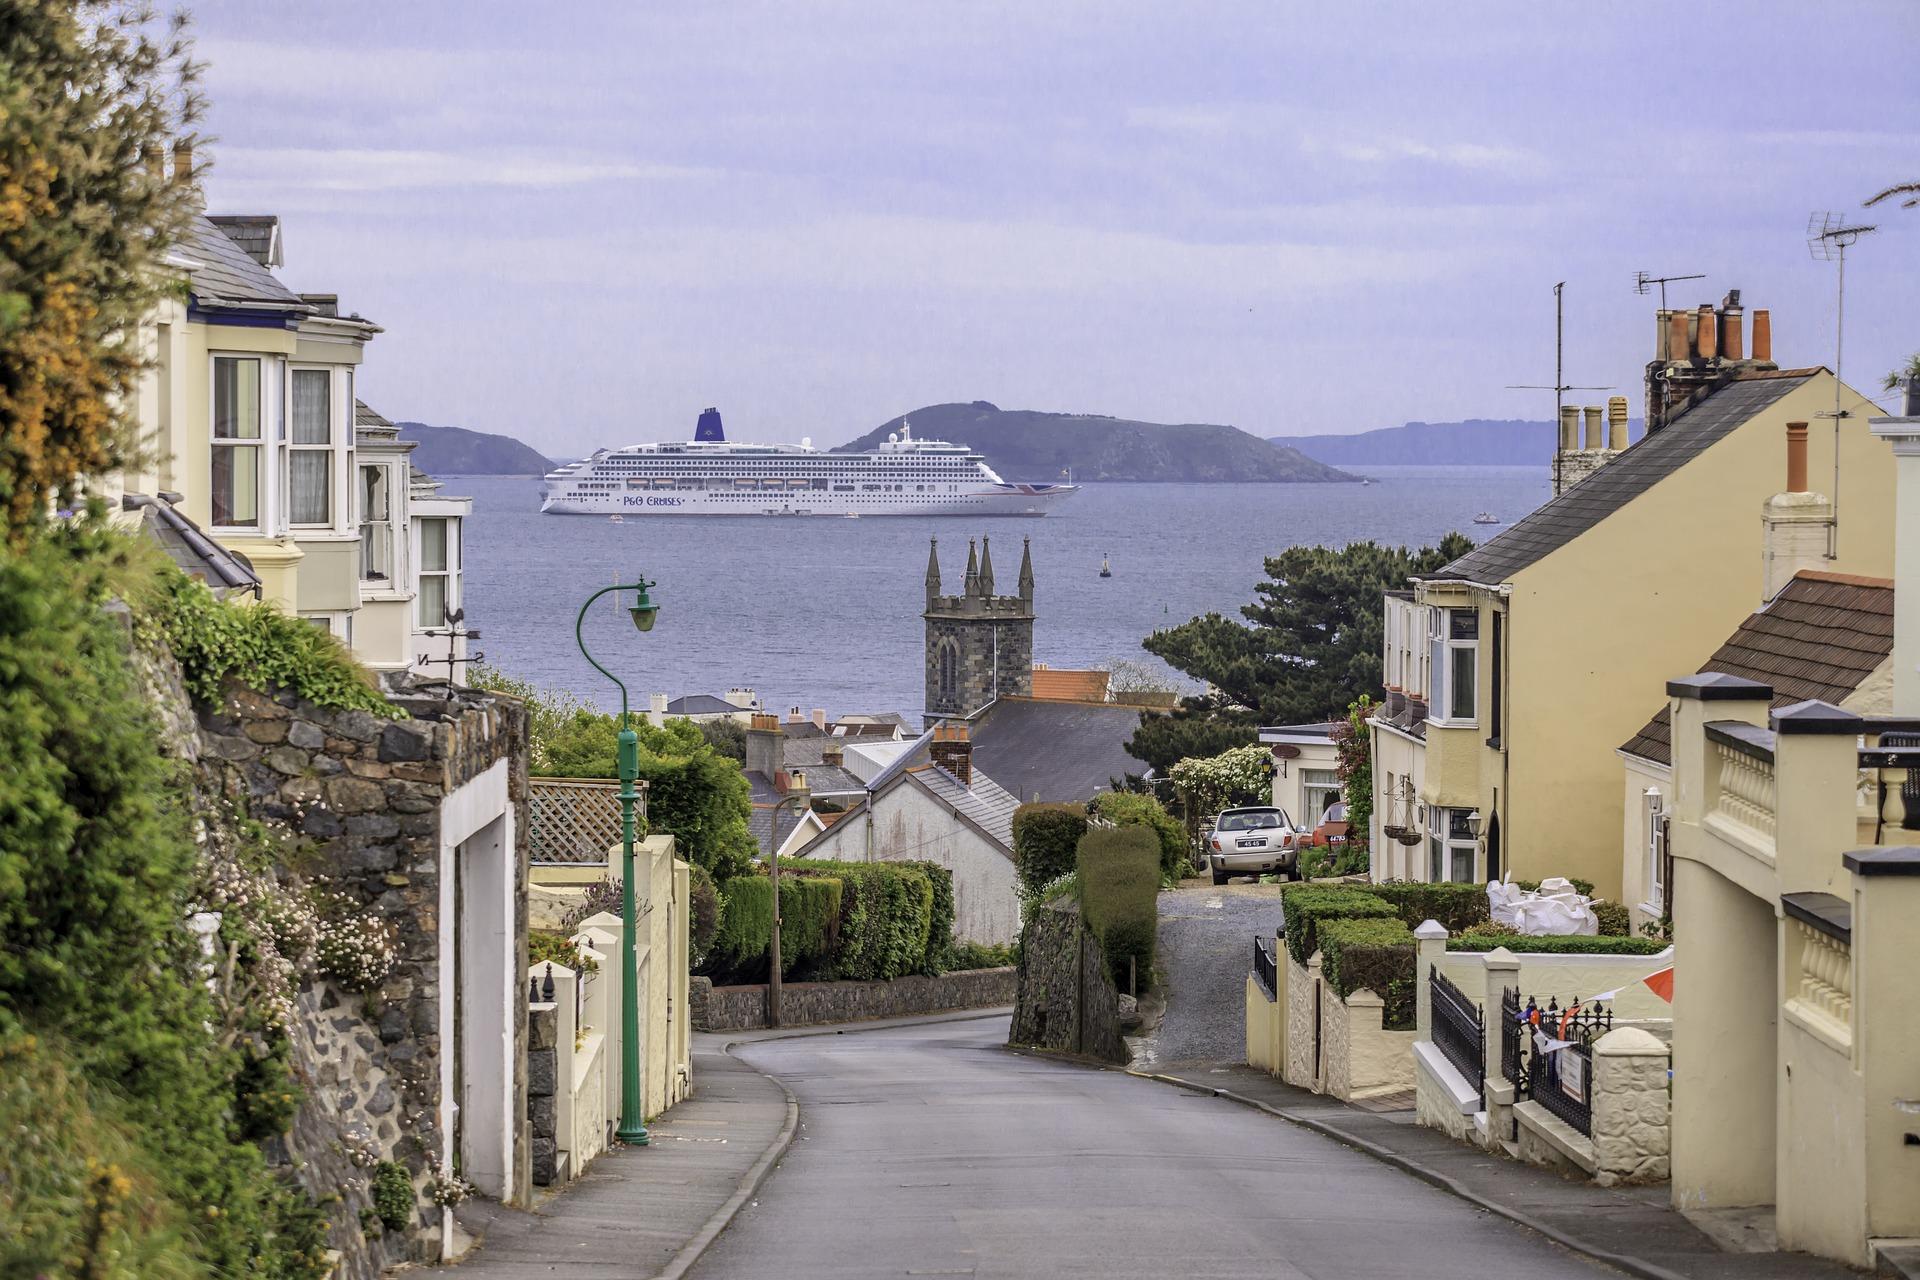 Guernsey Port